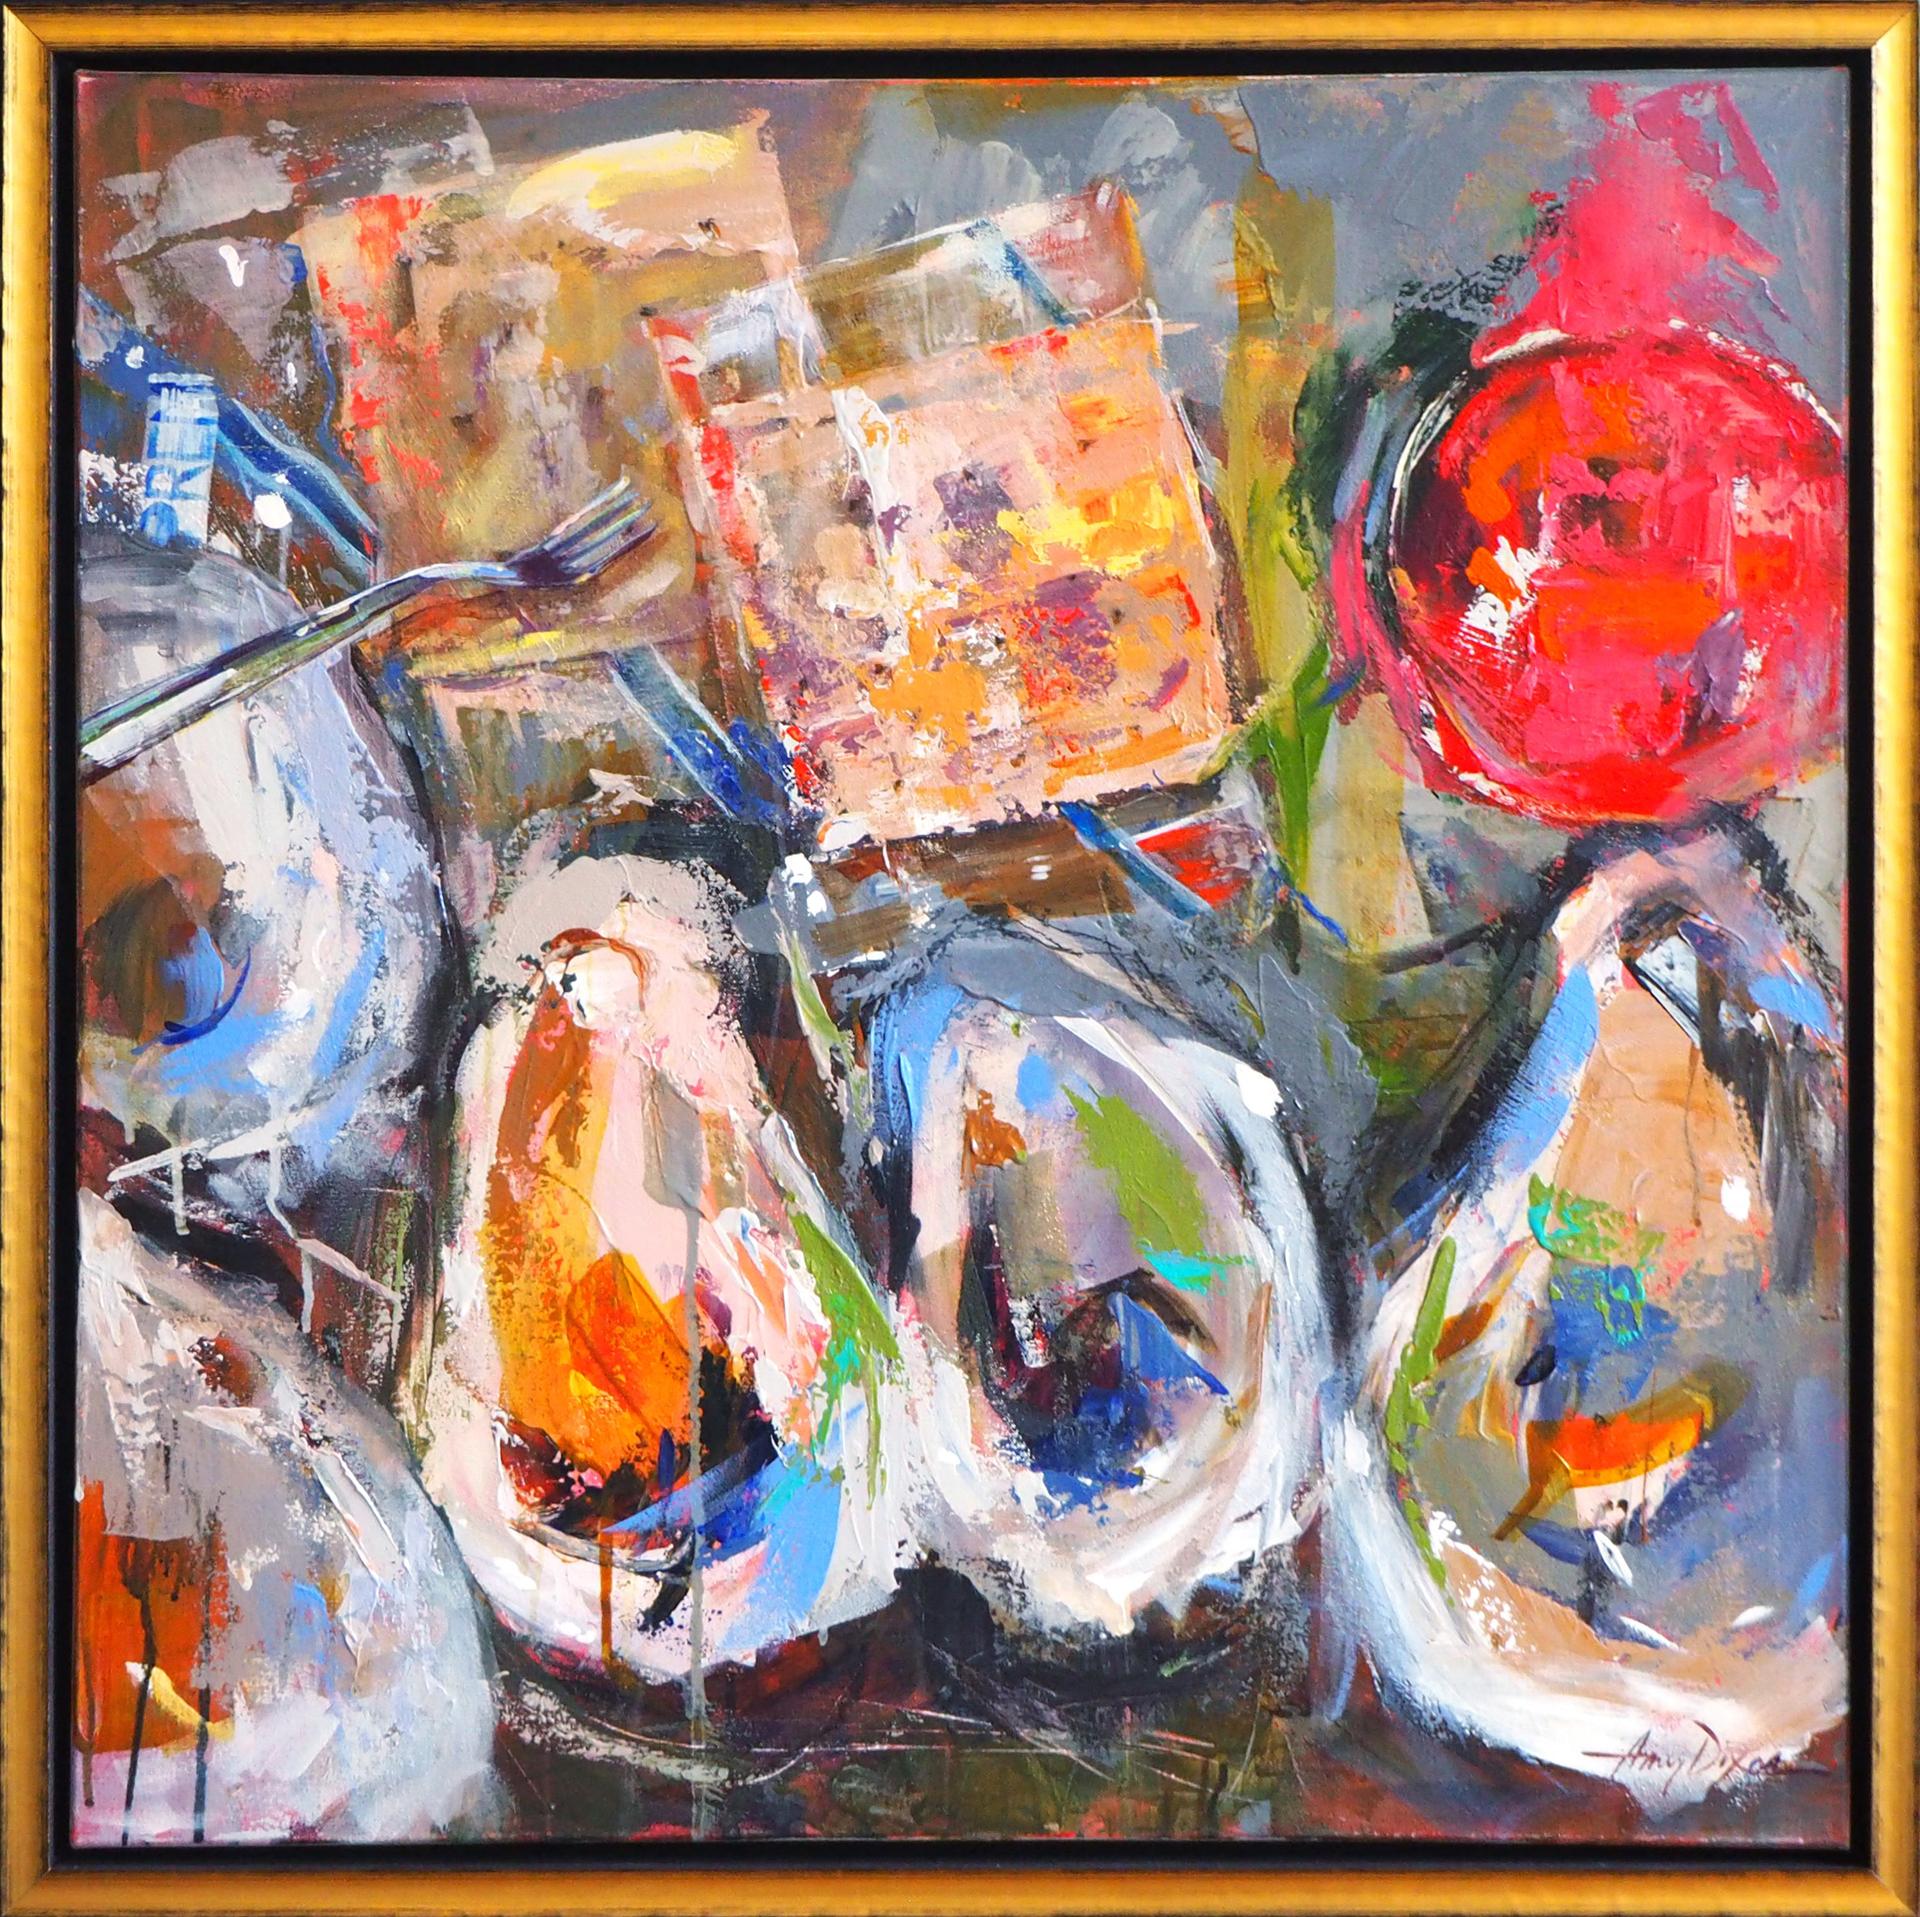 Saltines by Amy Dixon